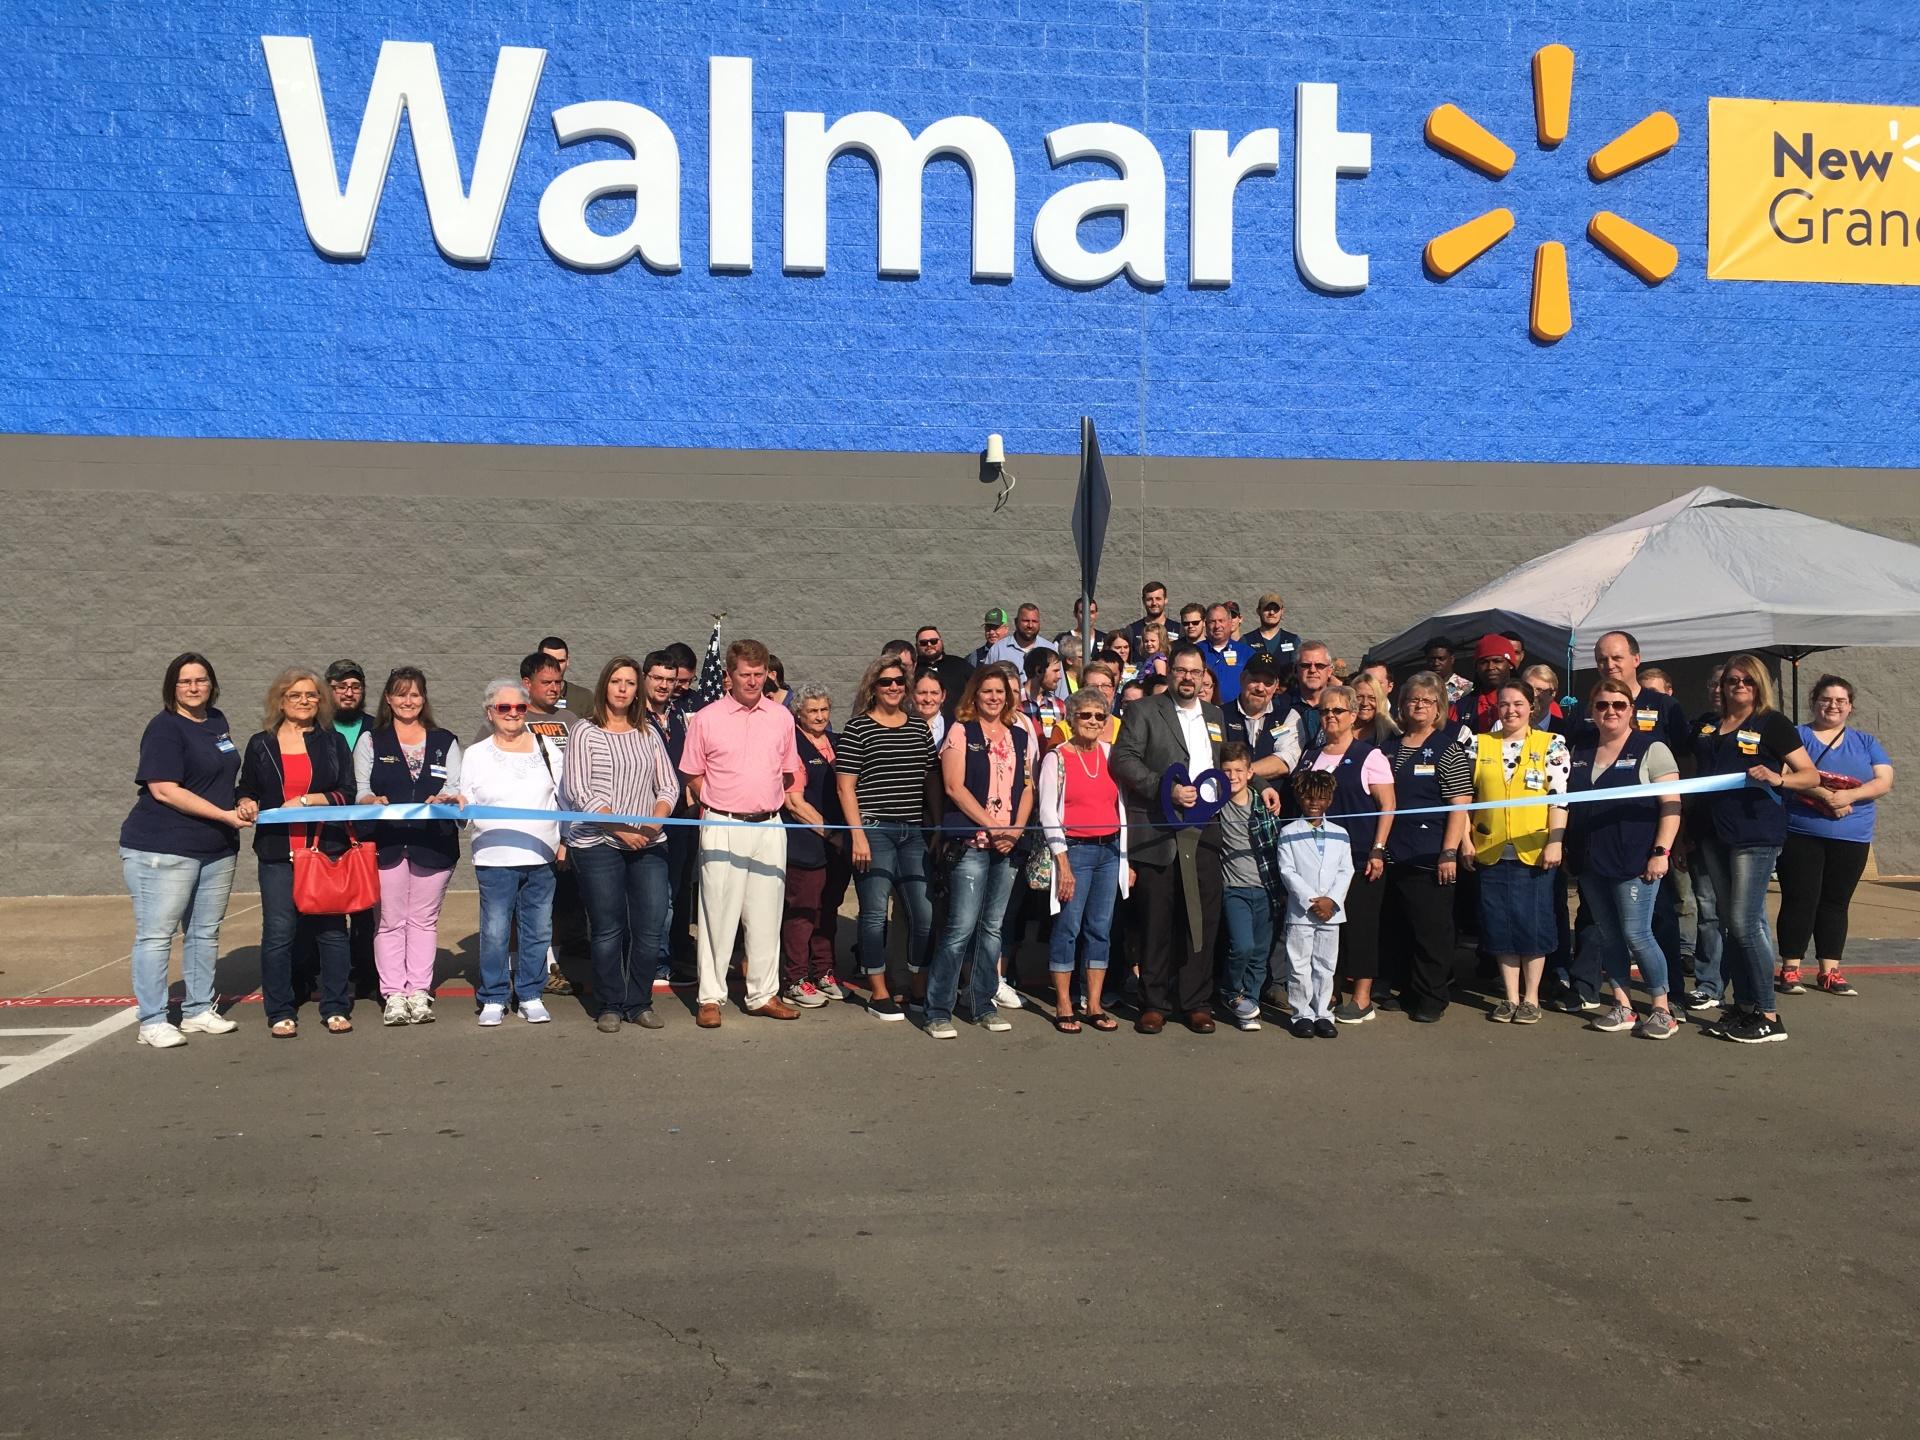 Walmart hosts grand re-opening